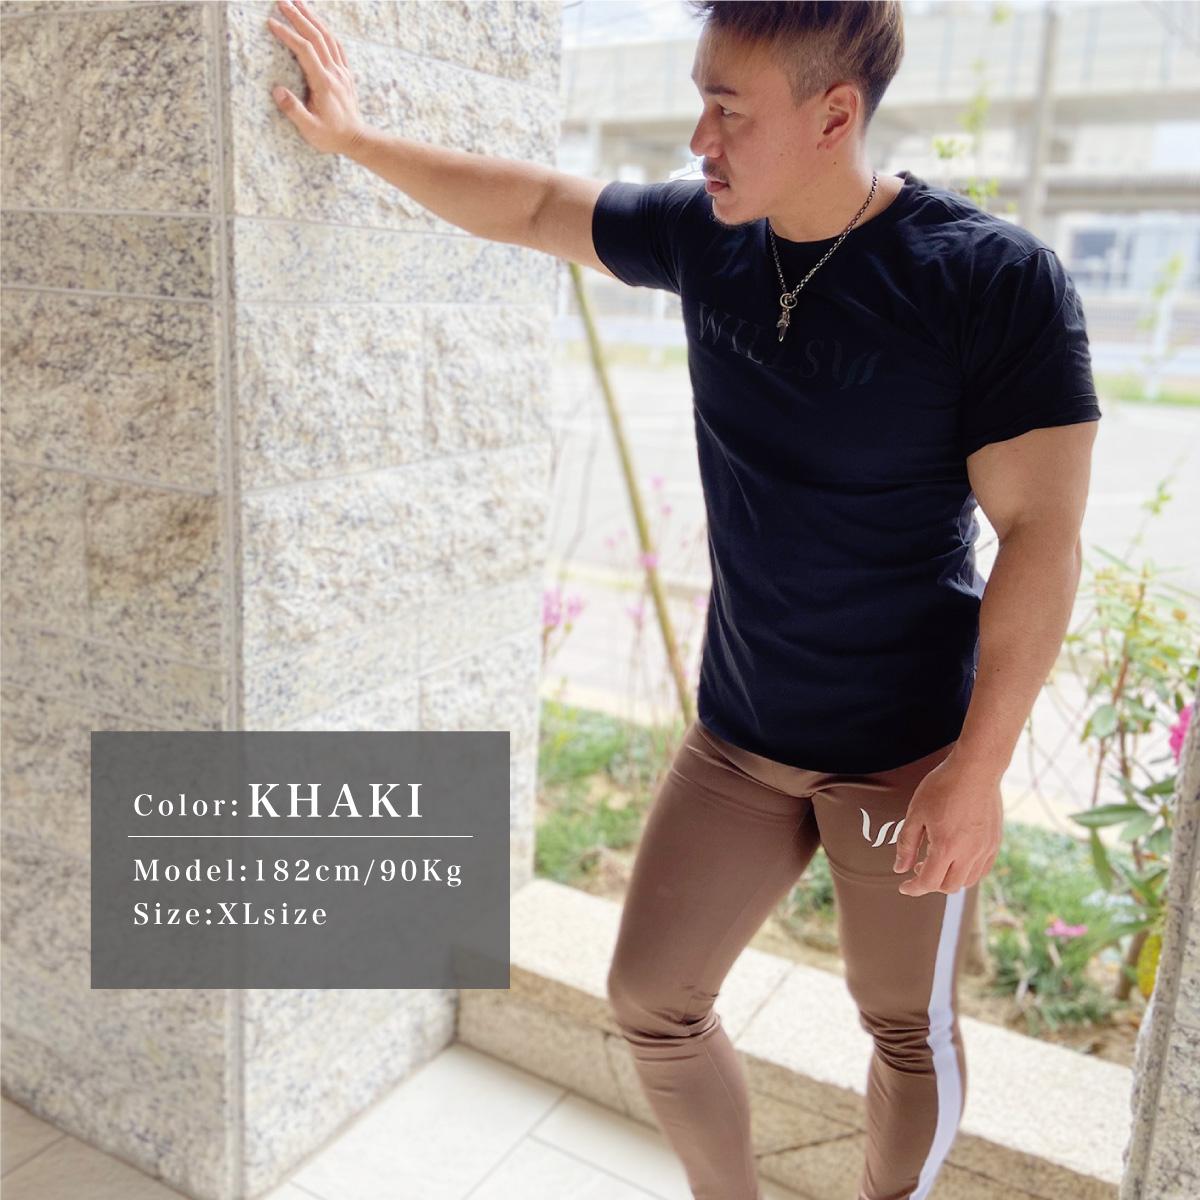 STRIKE TAPERED JOGGER - KHAKI